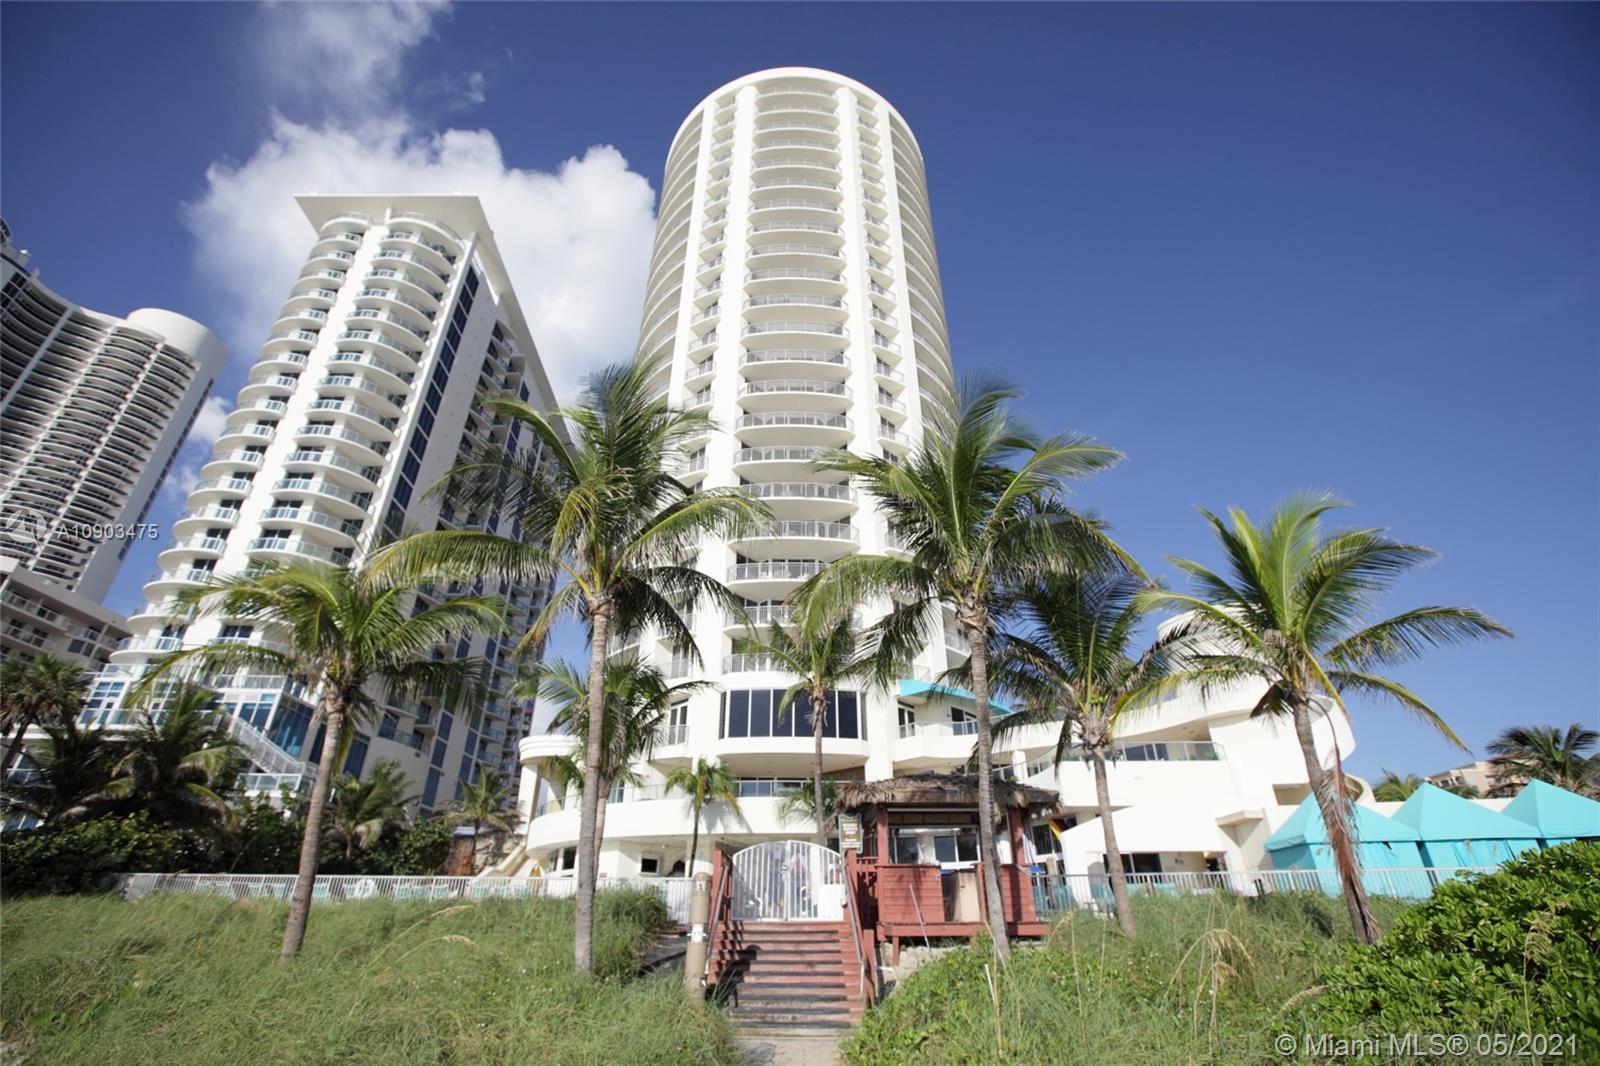 Ocean Point Beach Club #1003 - 17375 Collins Ave #1003, Sunny Isles Beach, FL 33160